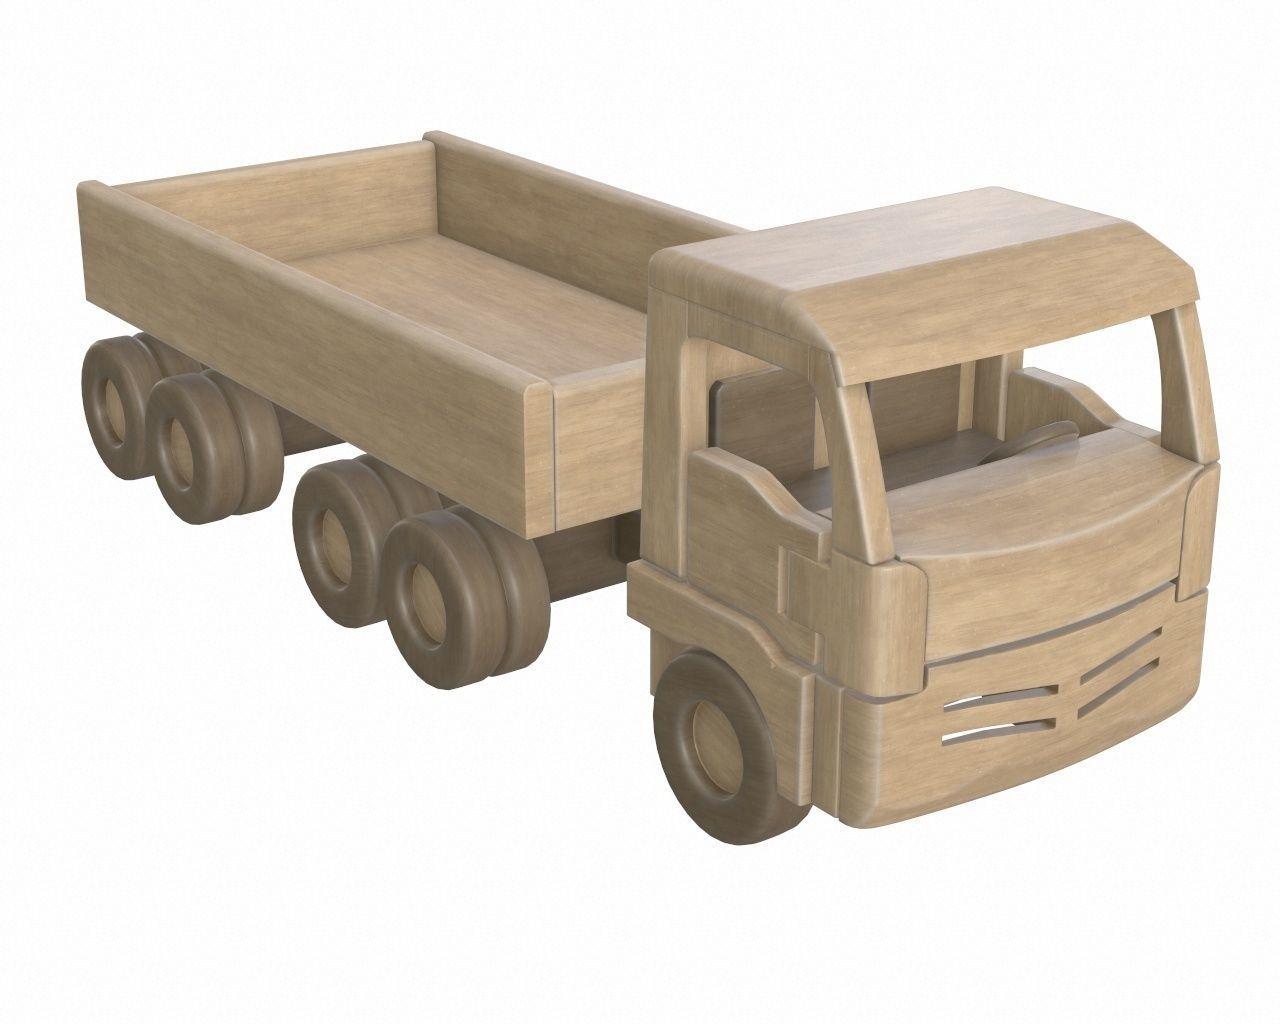 Truck wooden 2